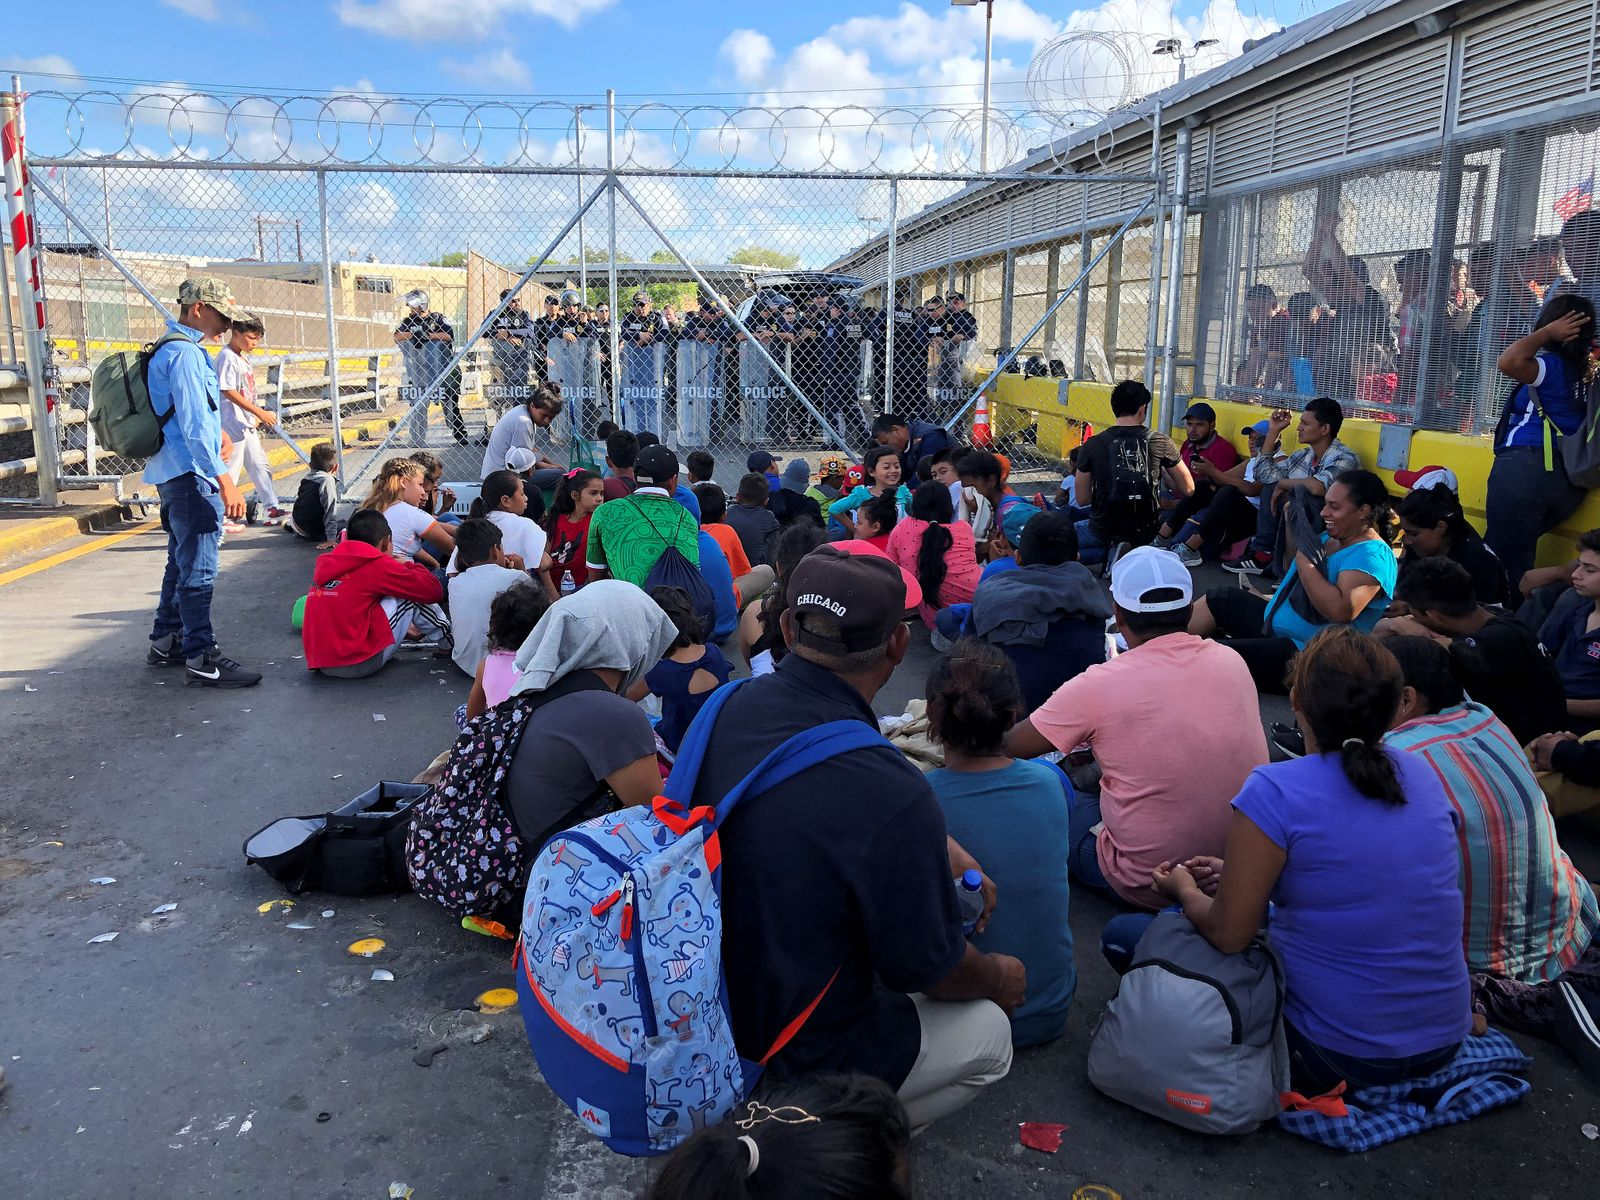 Migrants, returned to Mexico to await their U.S. asylum hearing, block the Puerta Mexico international border crossing bridge to demand quickness in their asylum process in Matamoros